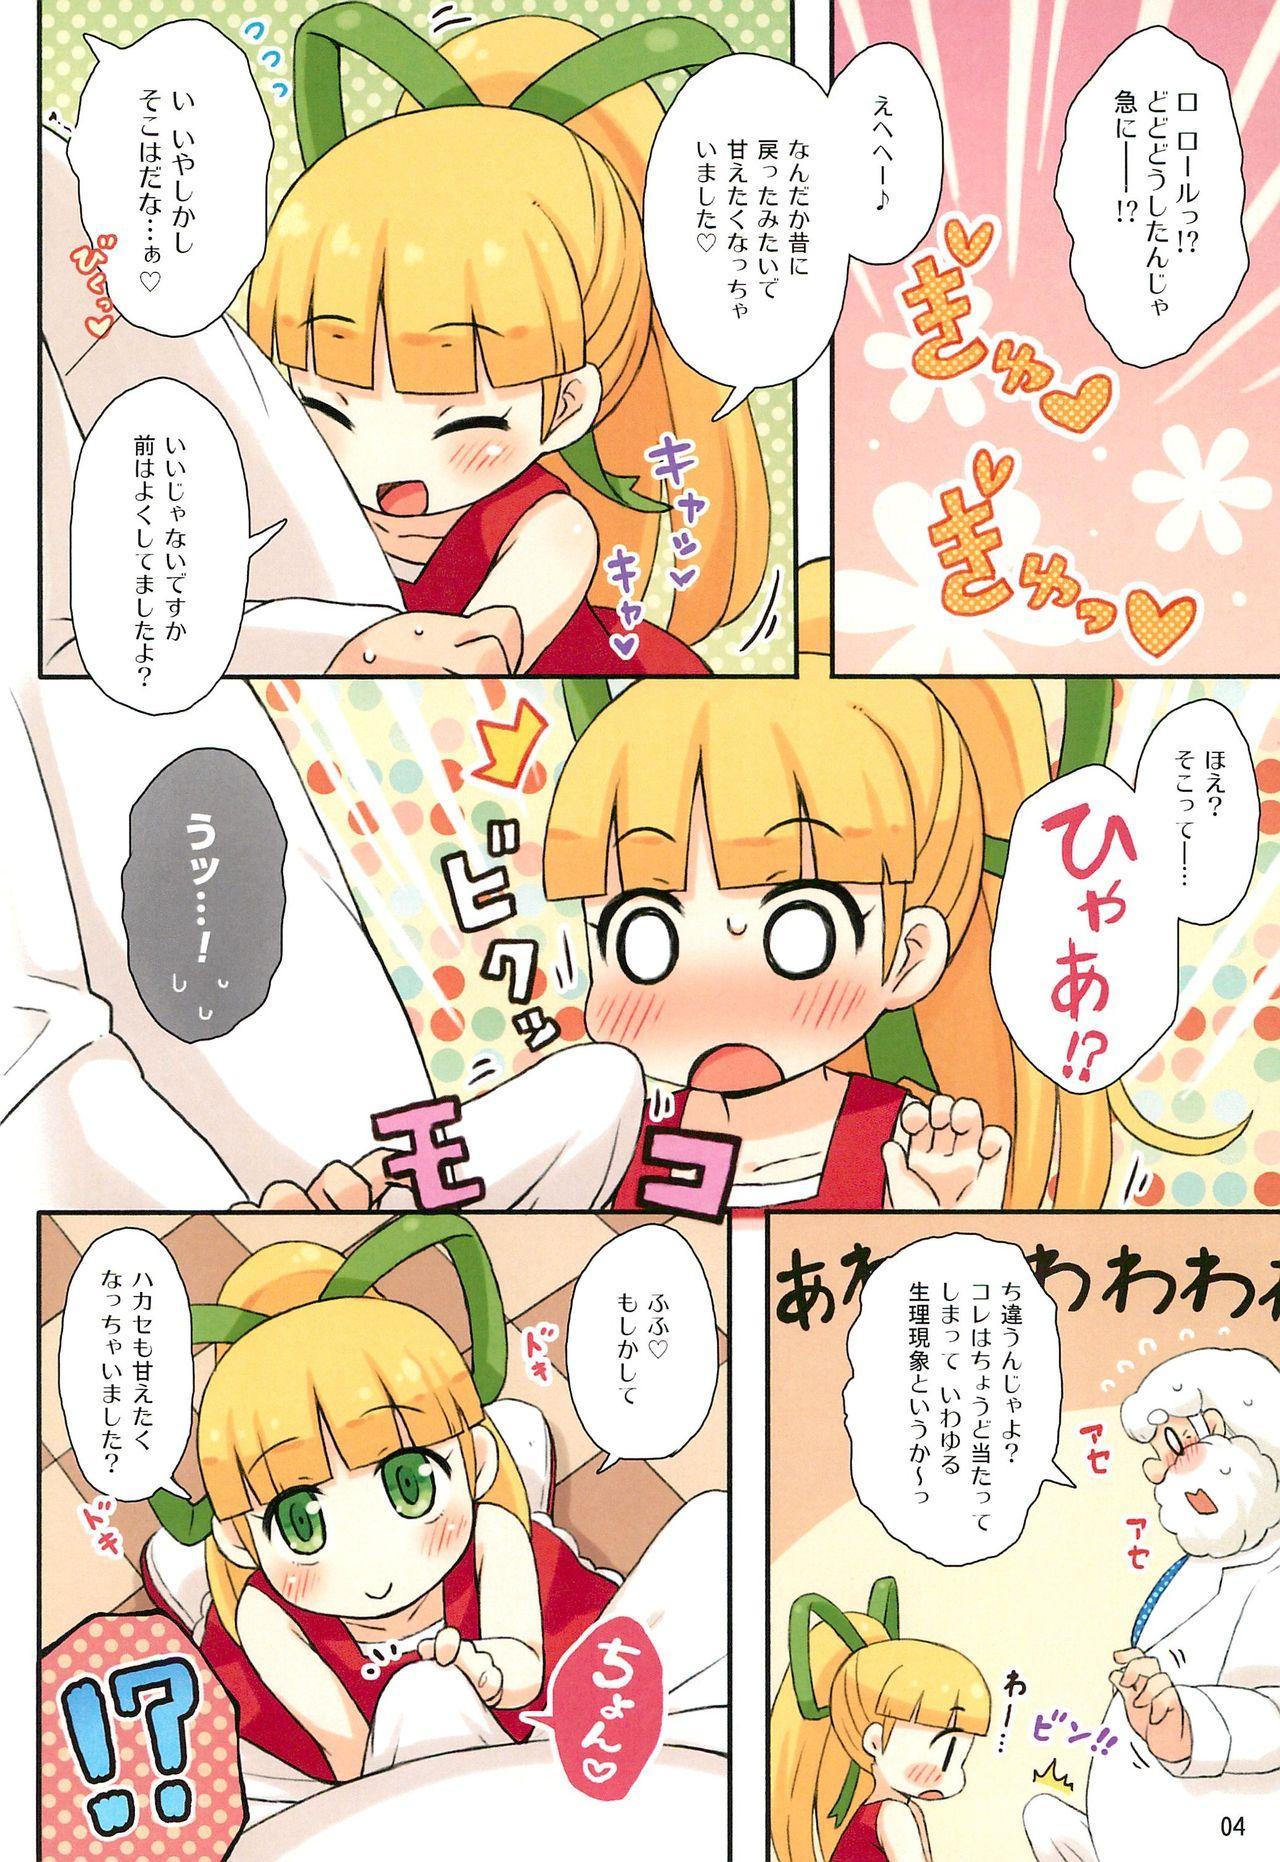 Roll-chan to Hakase no Nichijou 3